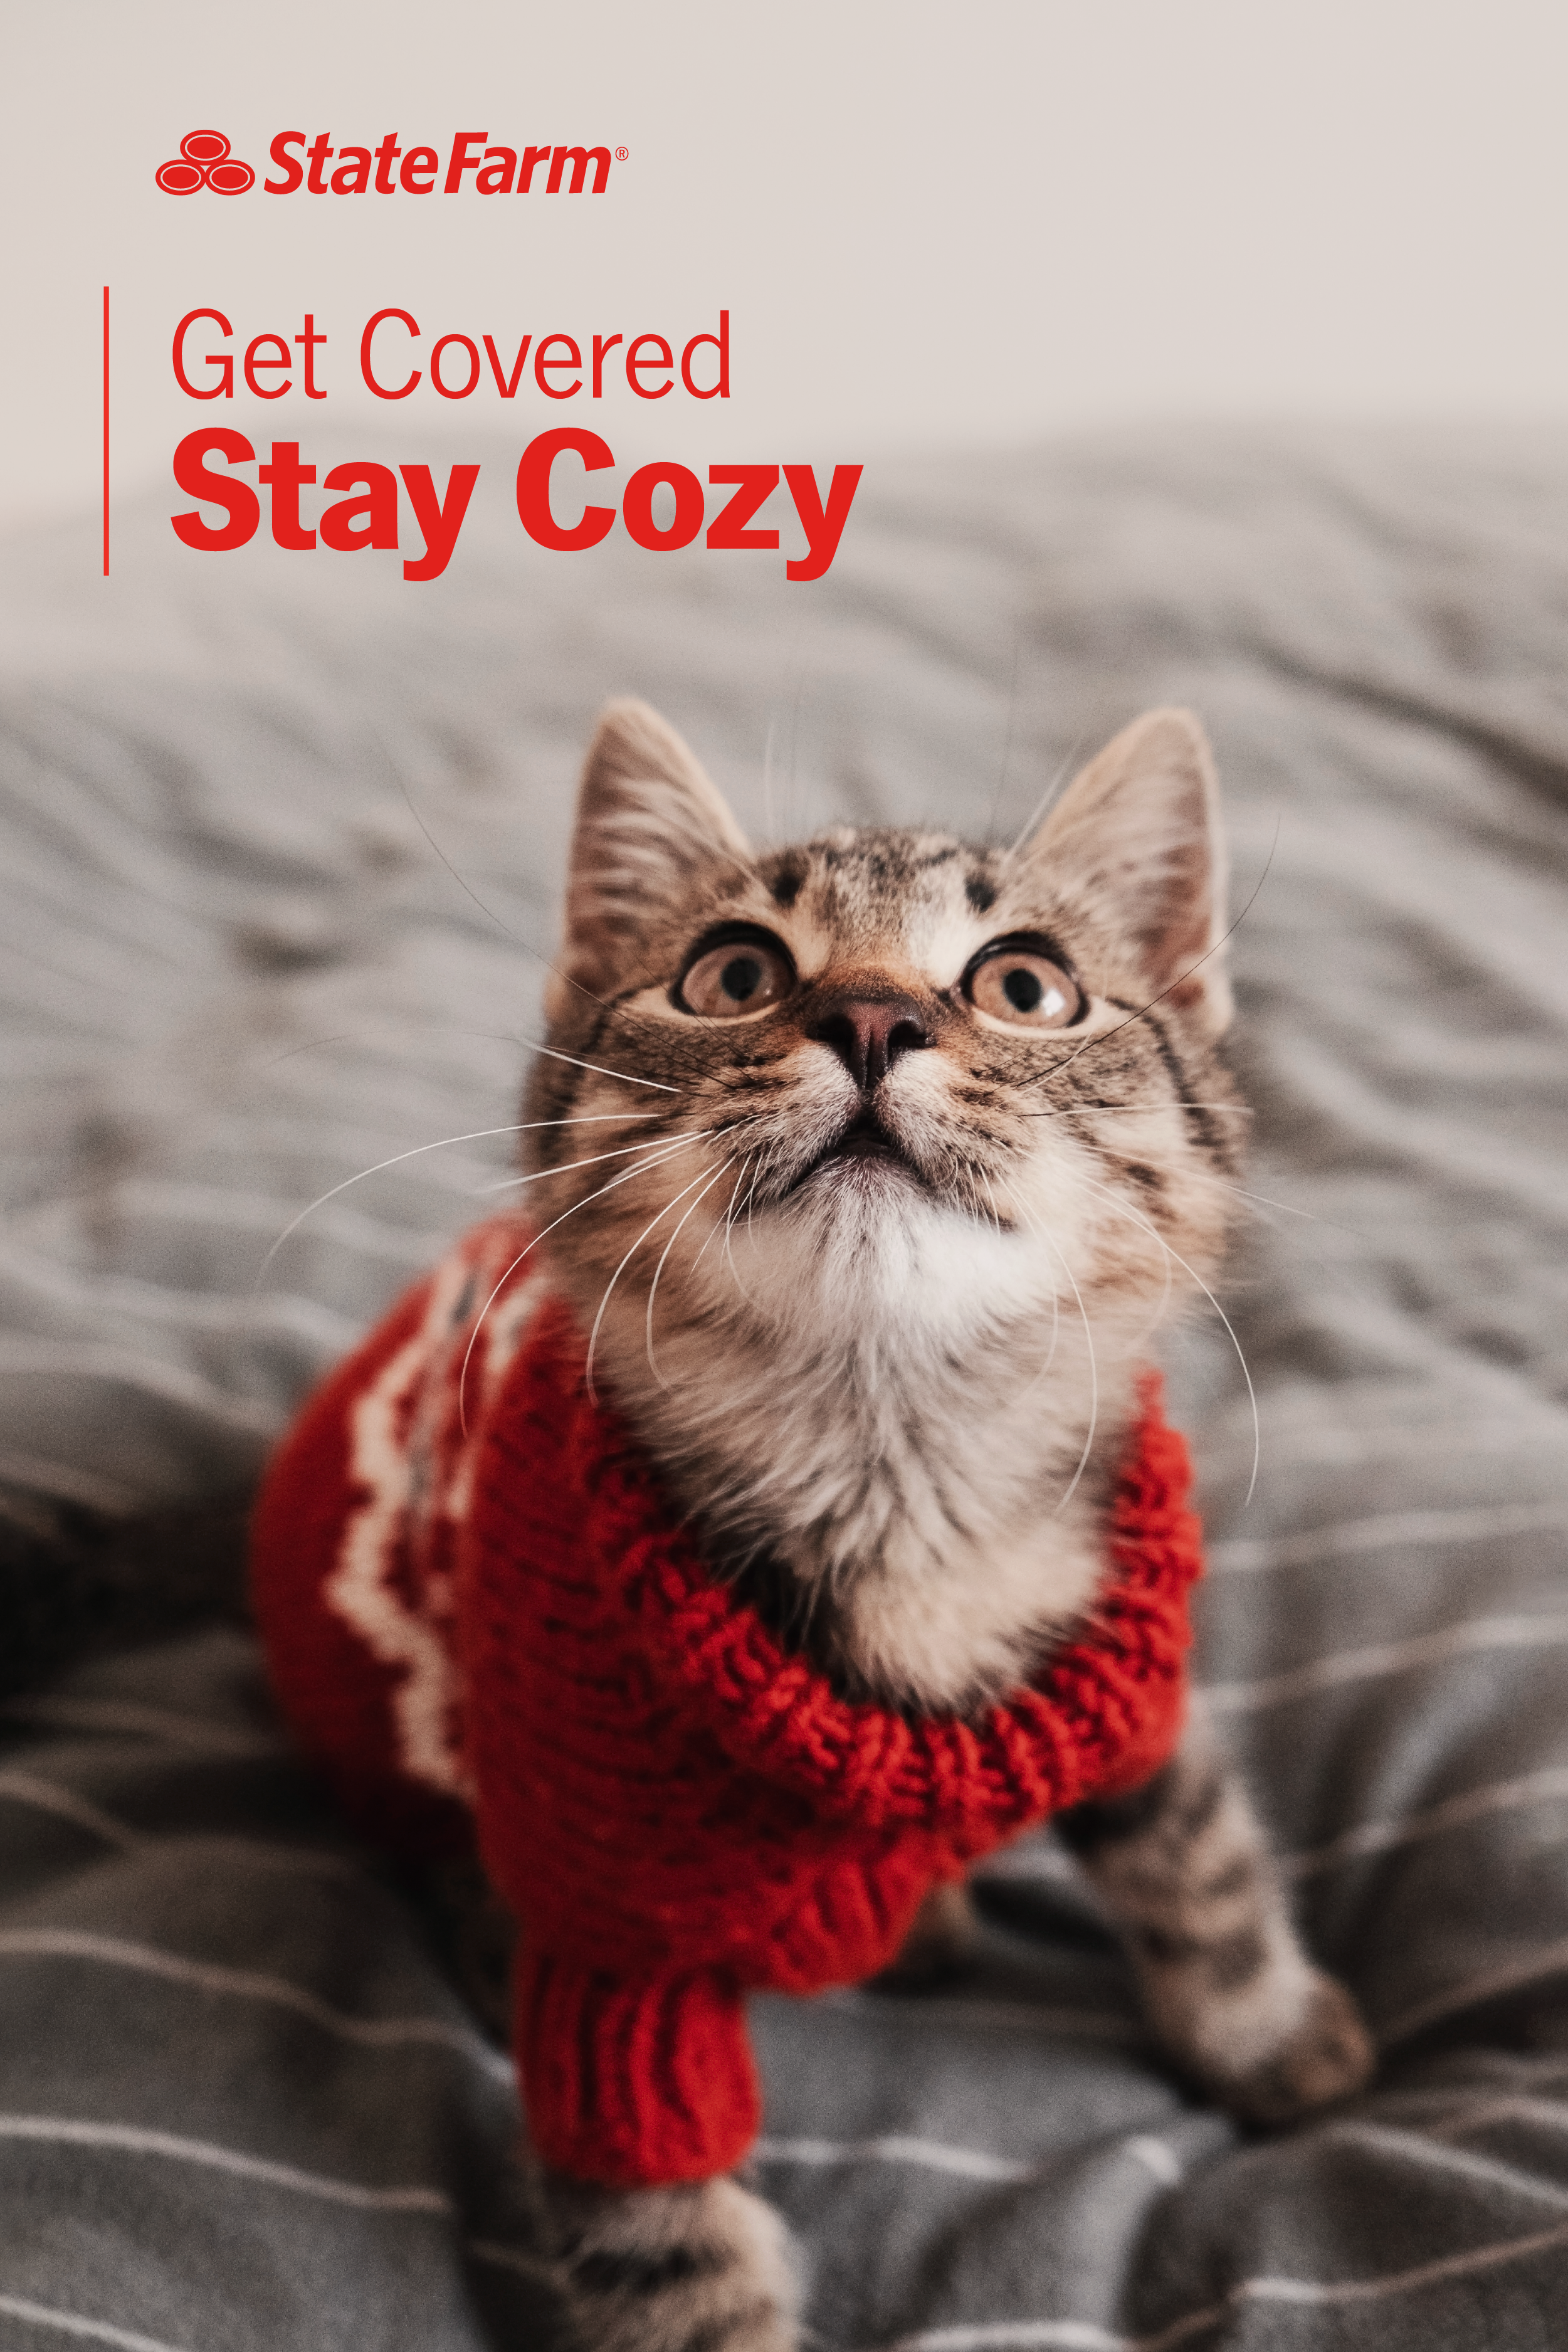 Get Covered Stay Cozy Pets State Farm Feline Leukemia